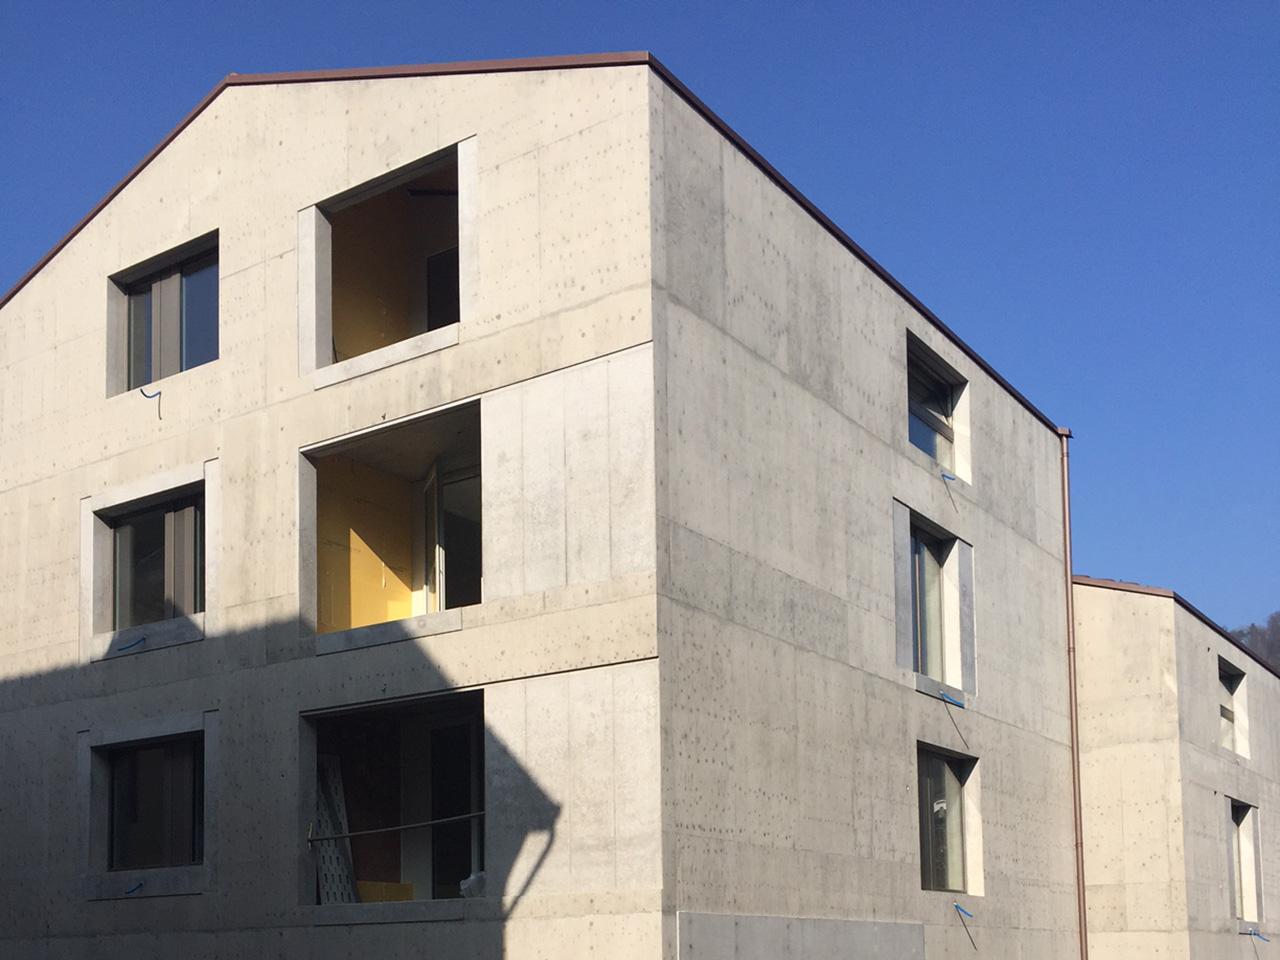 laubhus-immobilien-baustellenfortschritte-kauk-narrengasse-klingnau